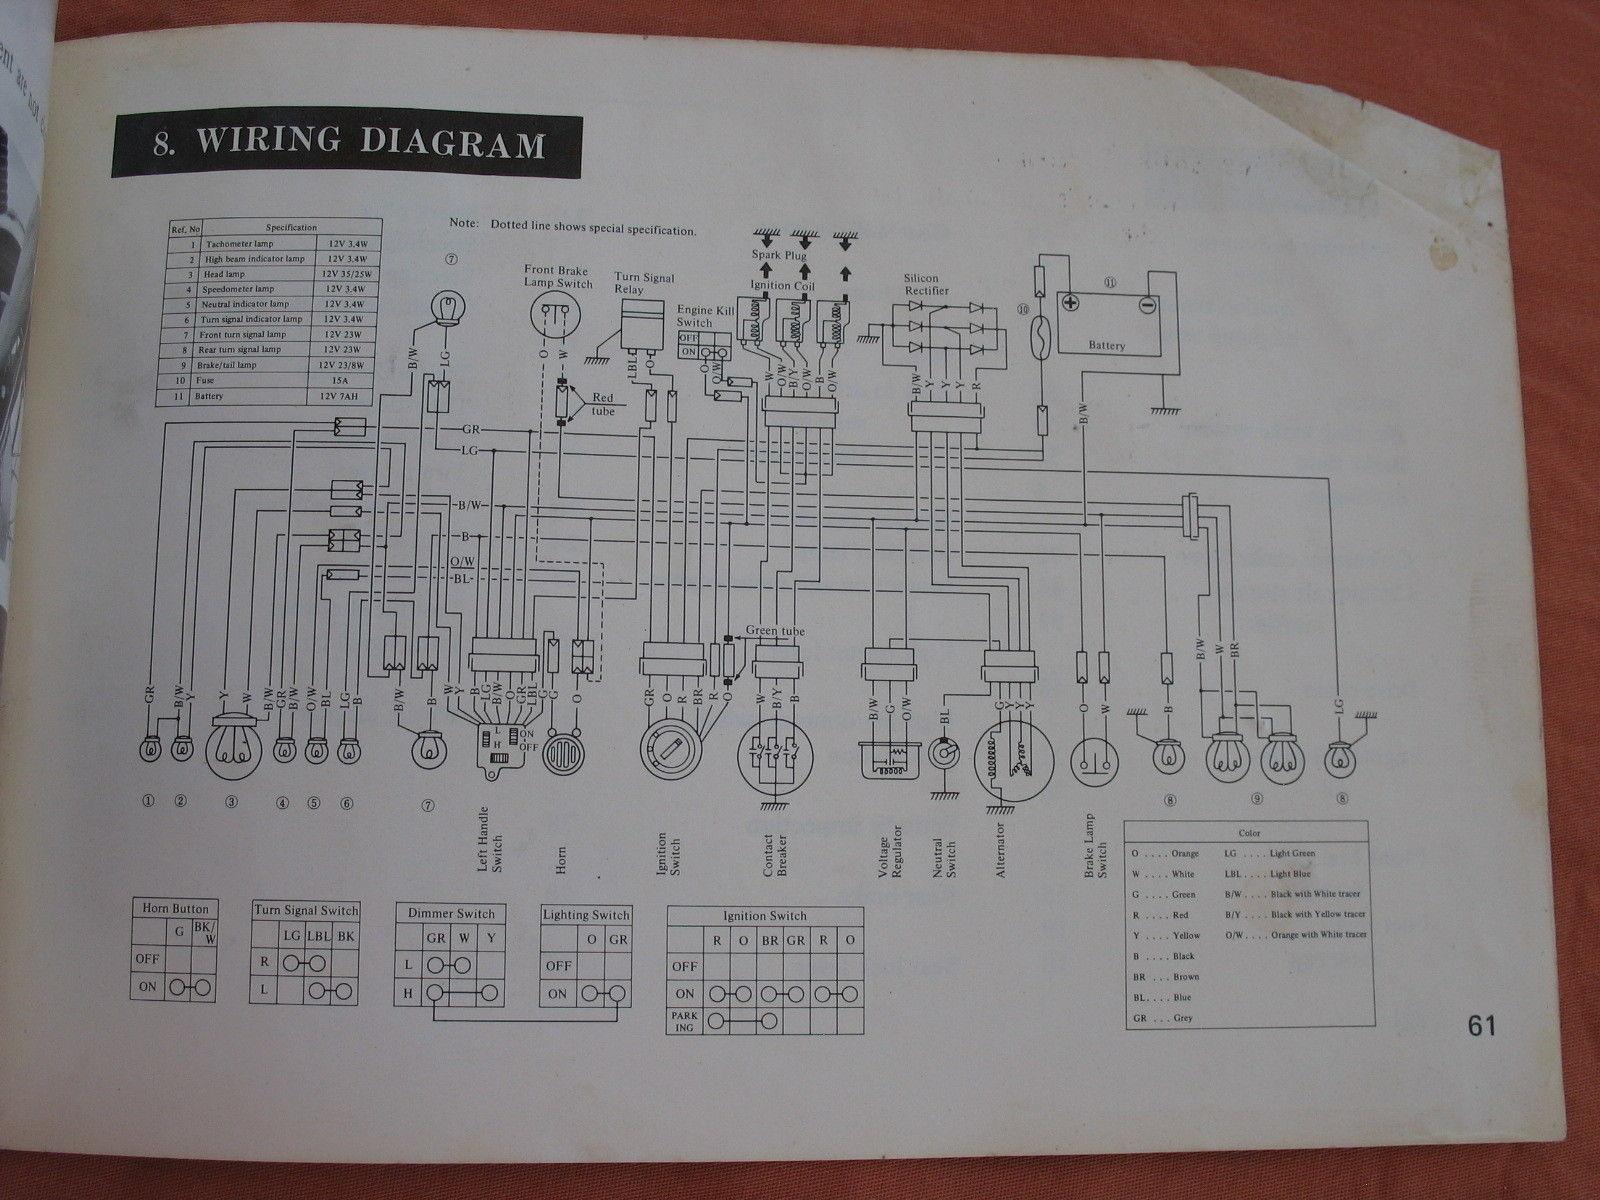 Suzuki Gt380 Wiring Diagram Library Gt750 1973 73 Gt 380 Sebring Owners Manual